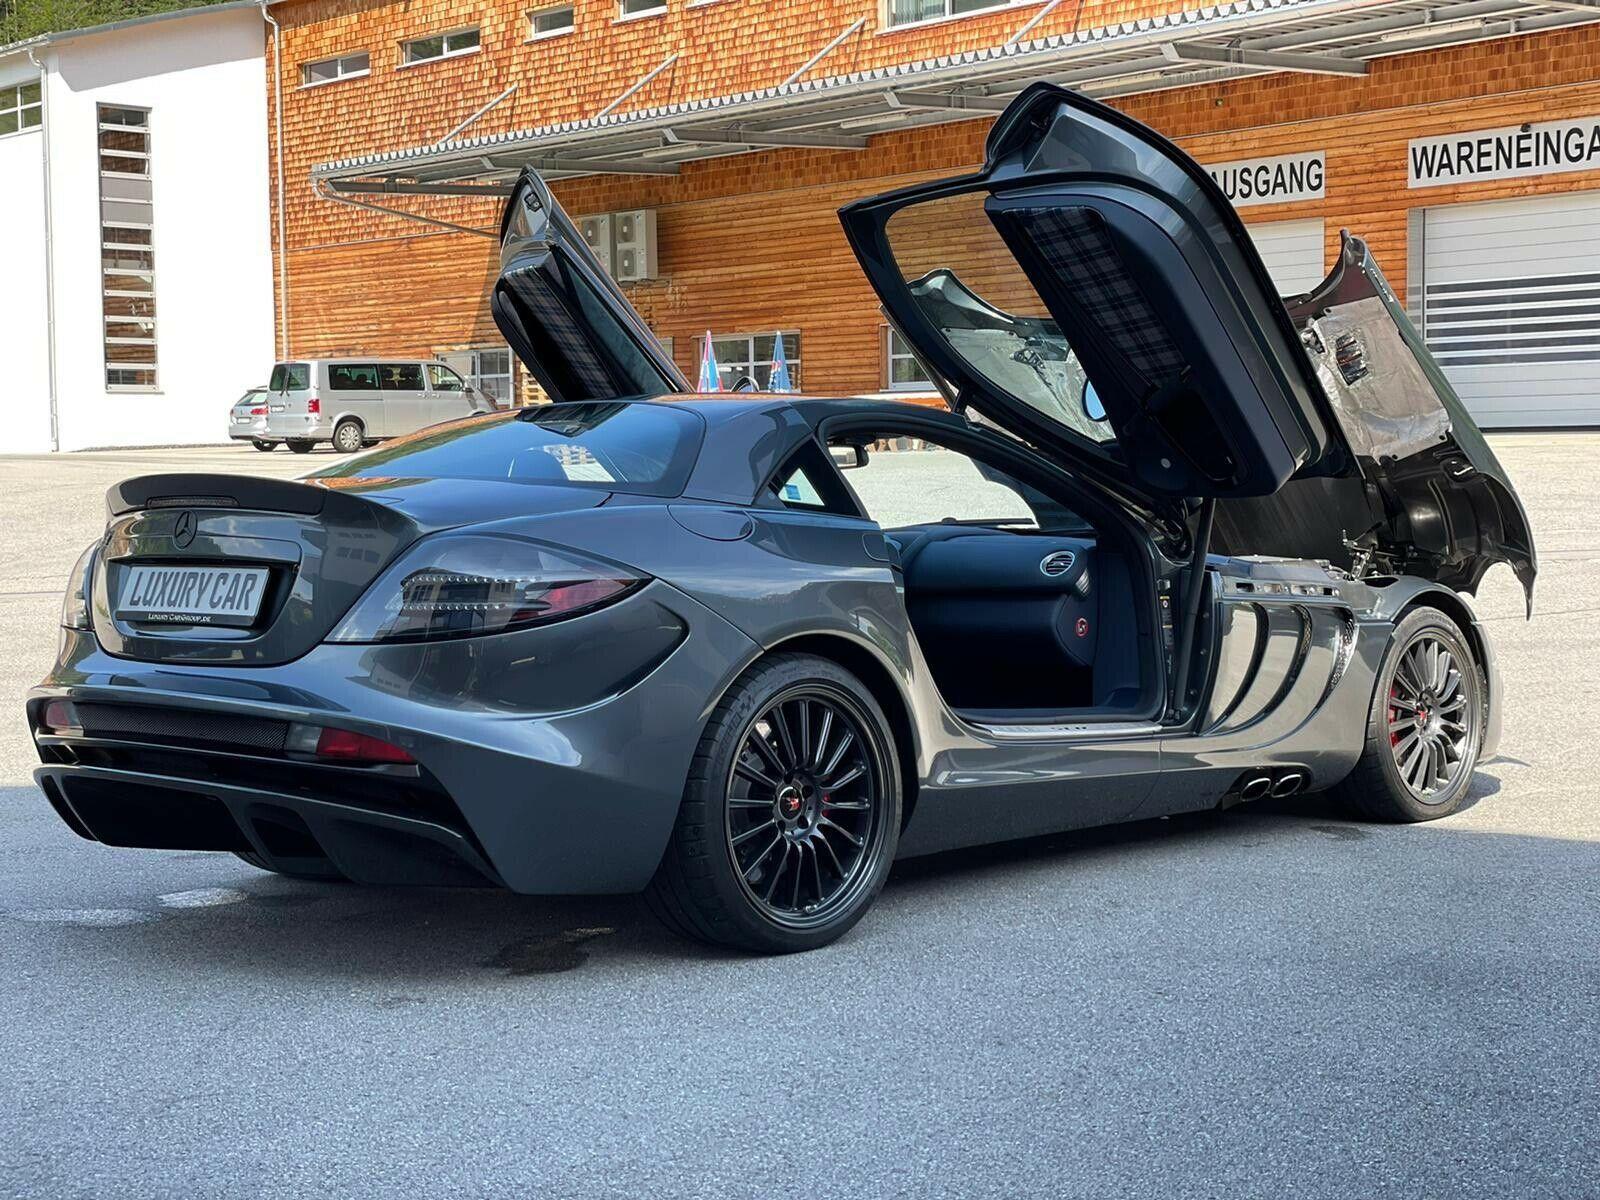 Mercedes-McLaren_SLR_722S_McLaren-Edition_sale-0006